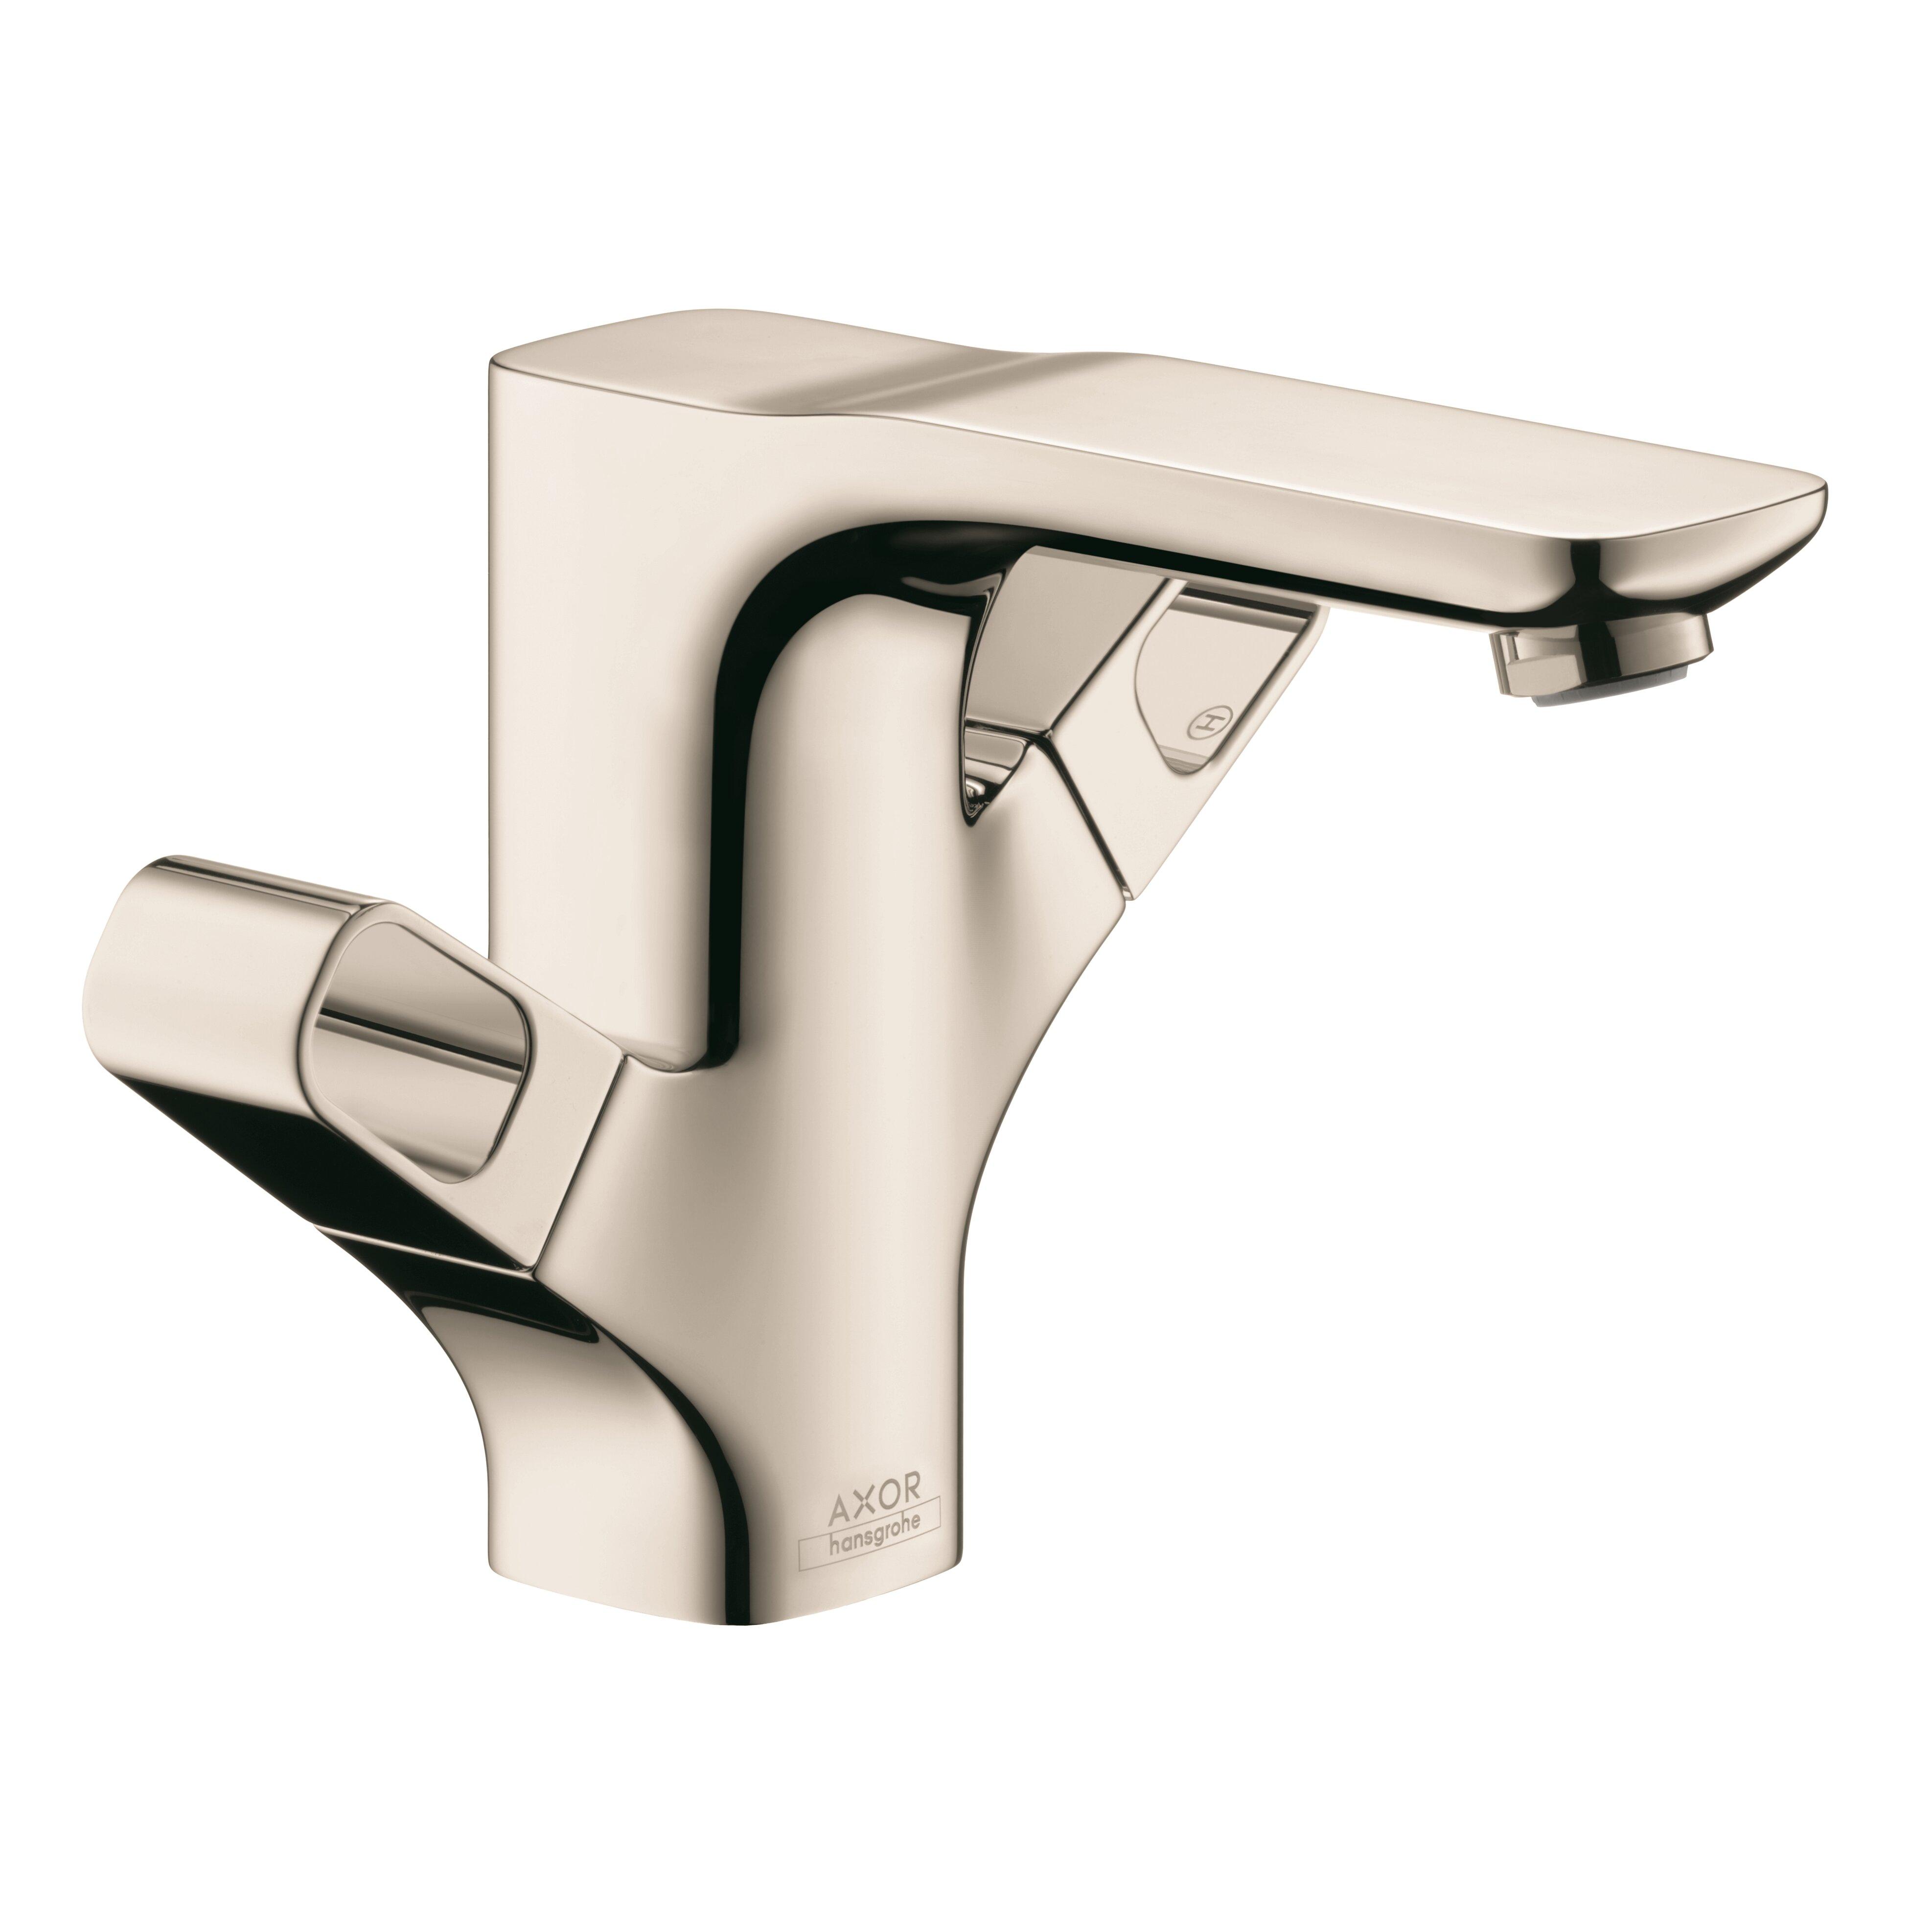 Axor Urquiola Double Handle Single Hole Bathroom Faucet by Hansgrohe